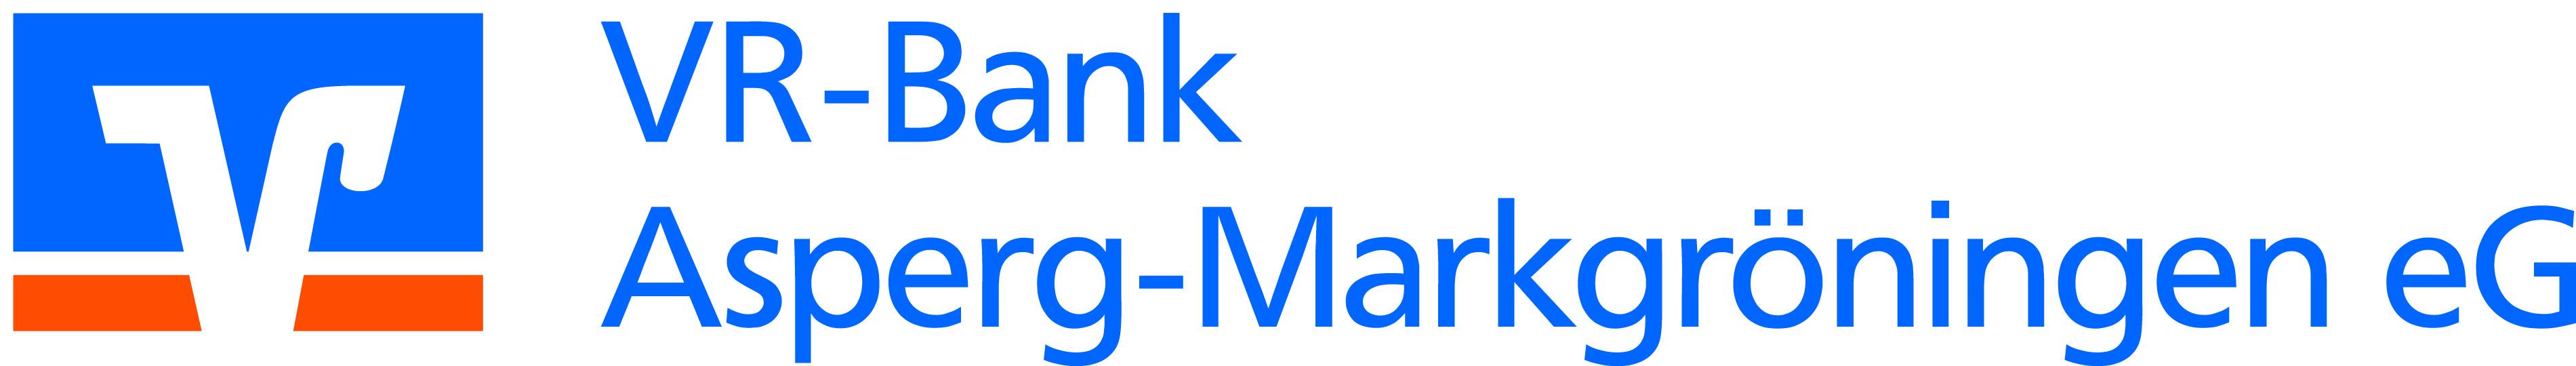 Unser Bildungspartner: Die VR-Bank Asperg-Markgröningen e.G.